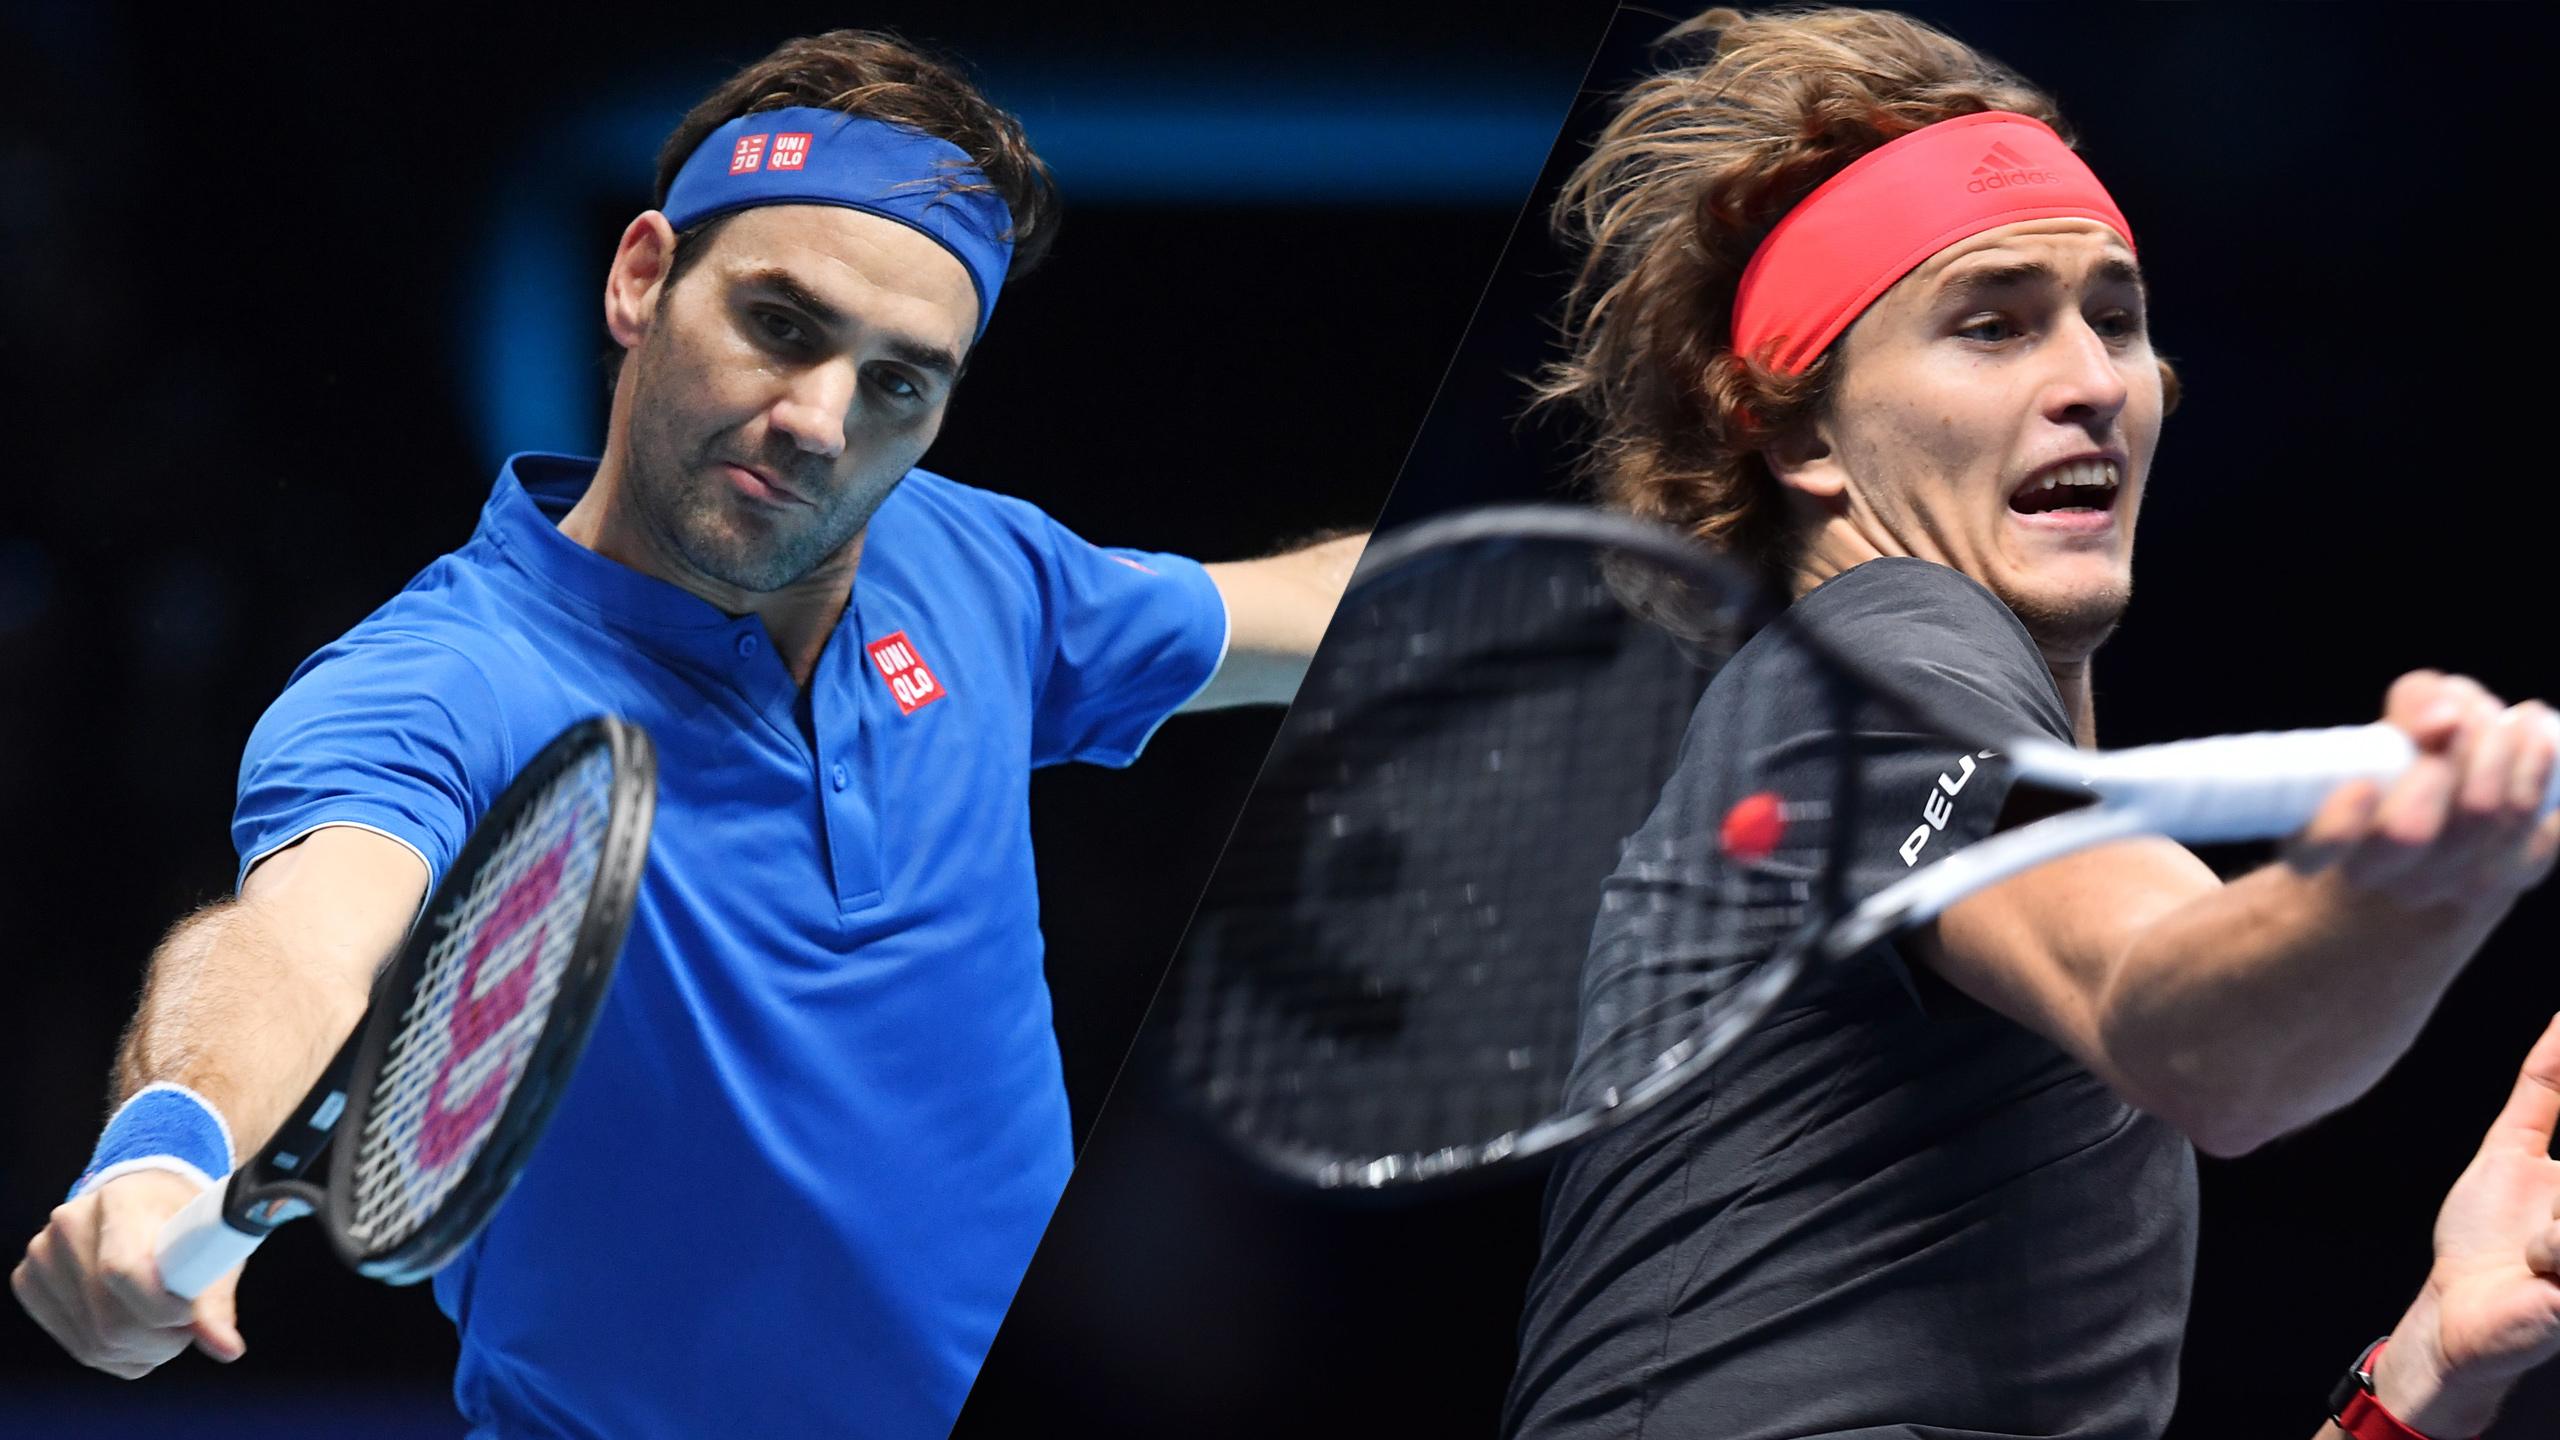 (2) Federer vs. (3) Zverev (Semifinal #1)